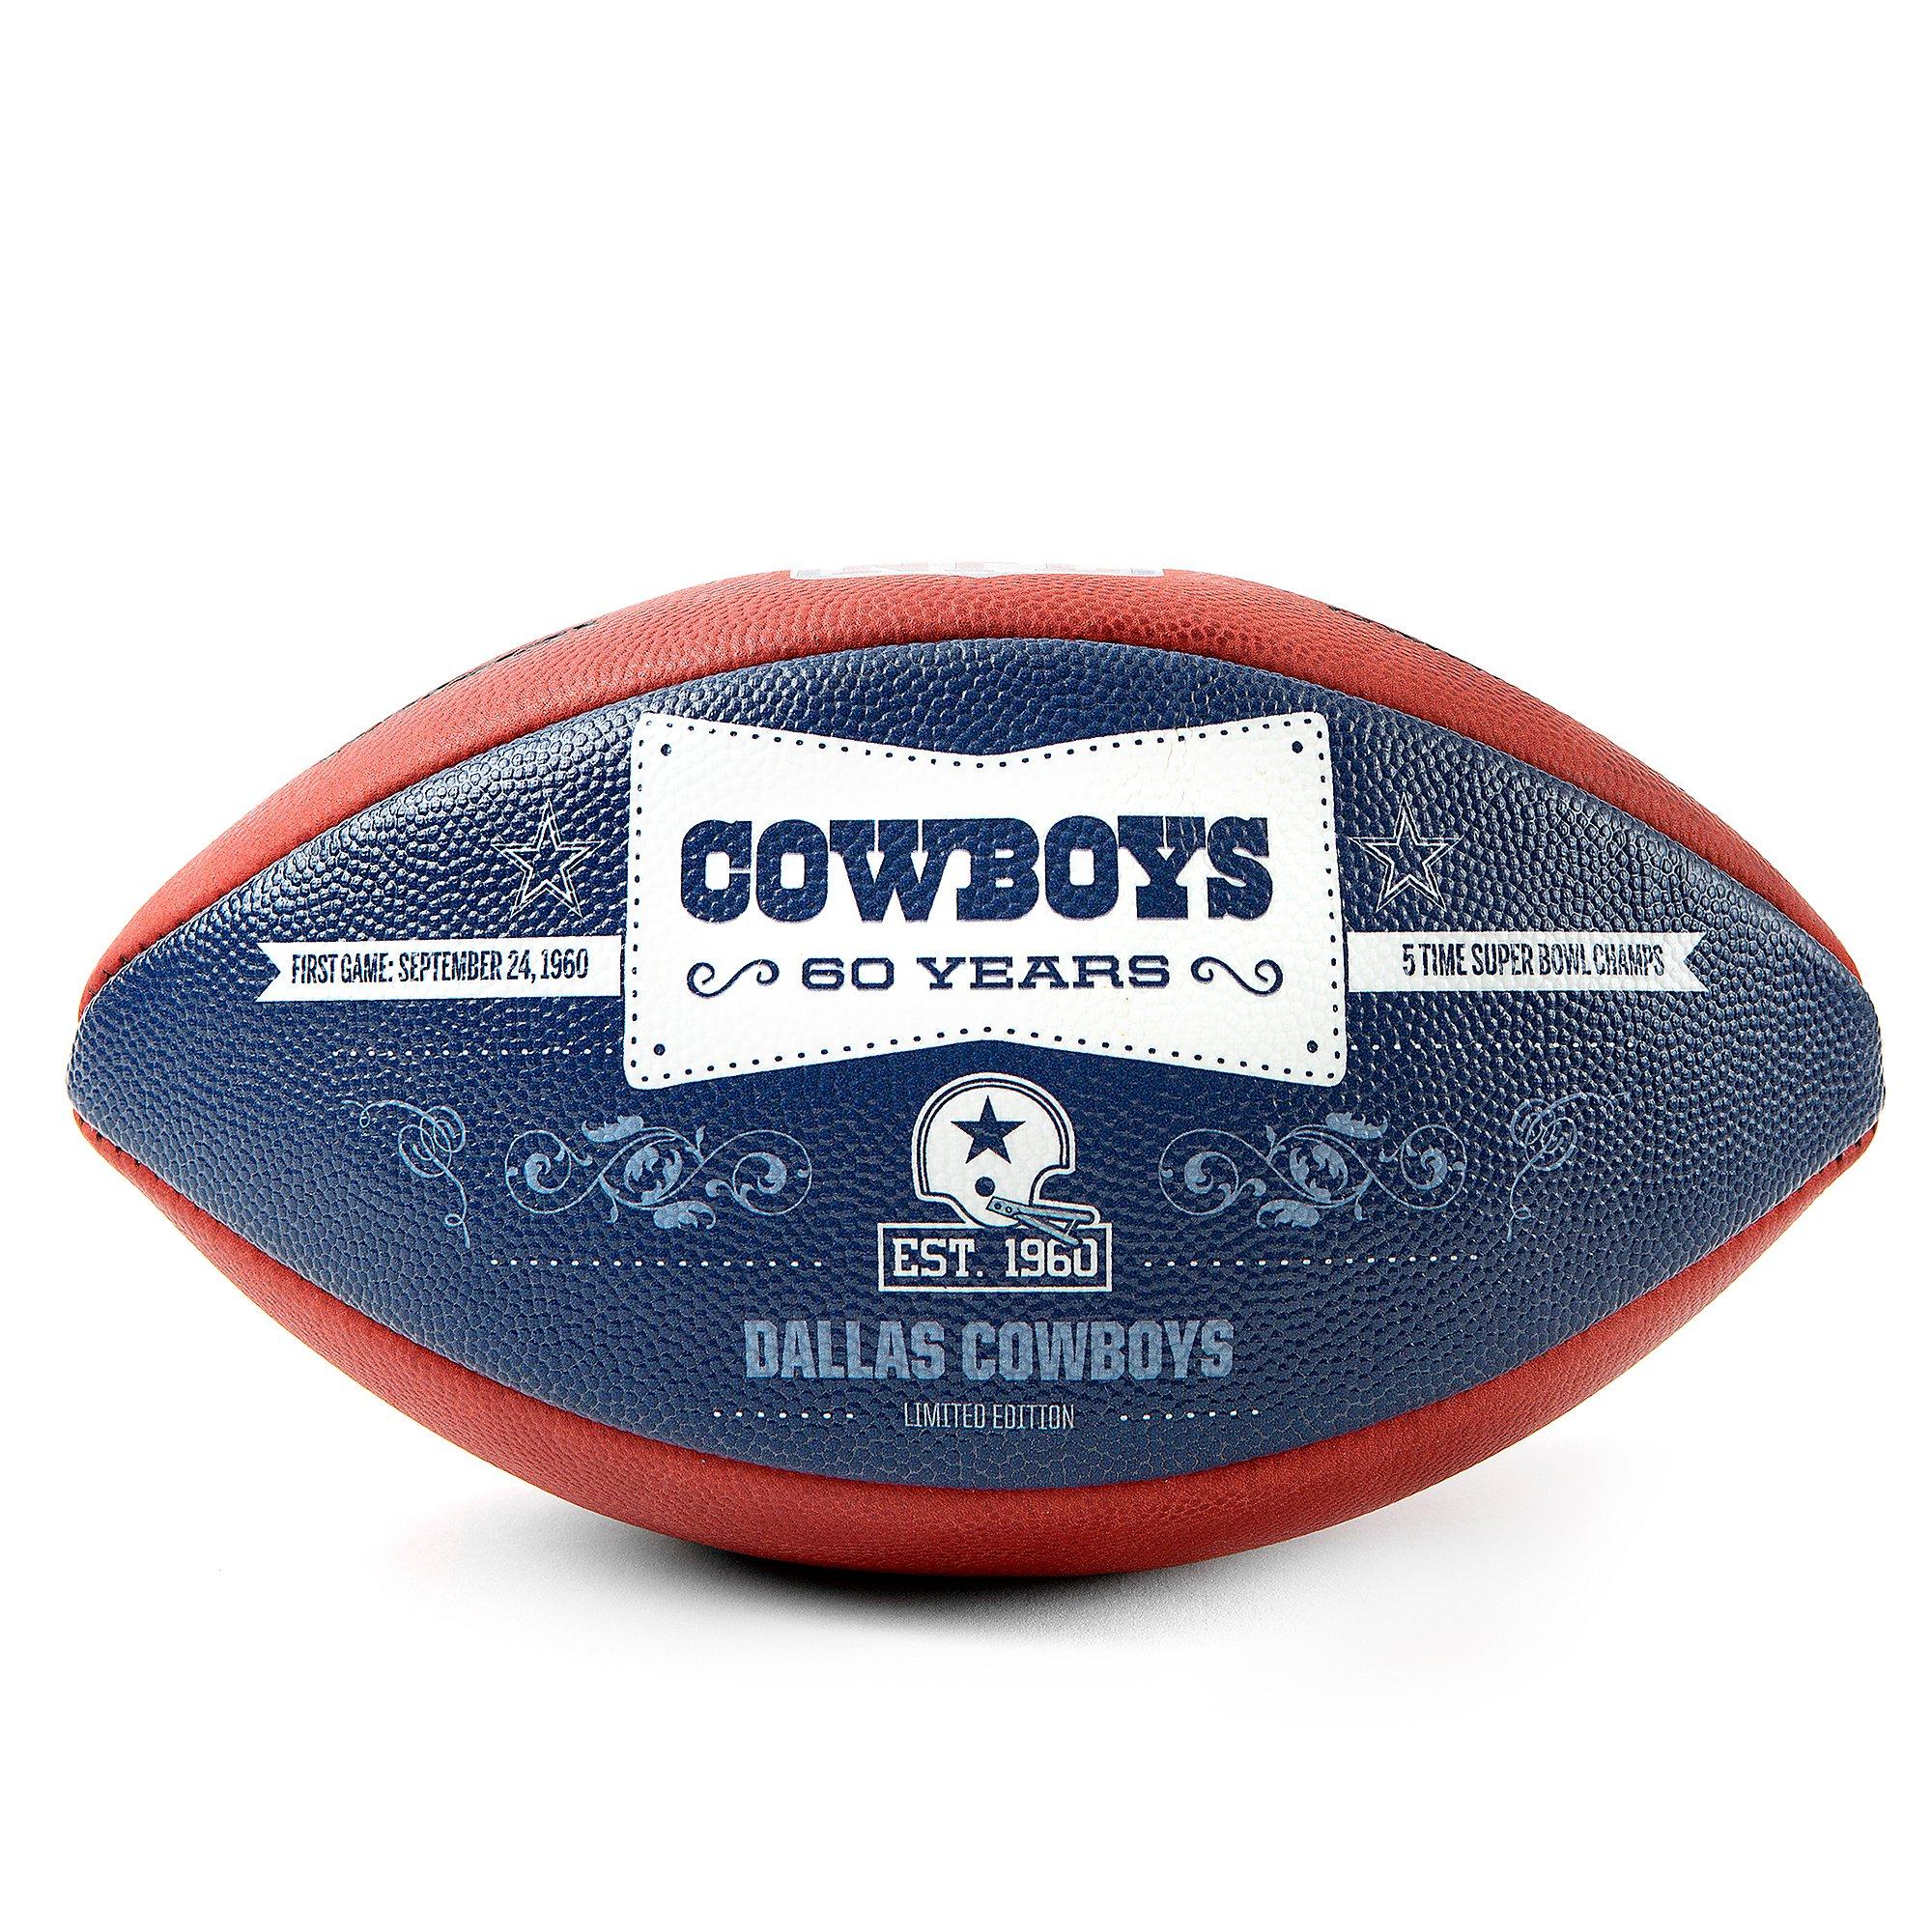 Dallas Cowboys Wilson 1960 Anniversary Football